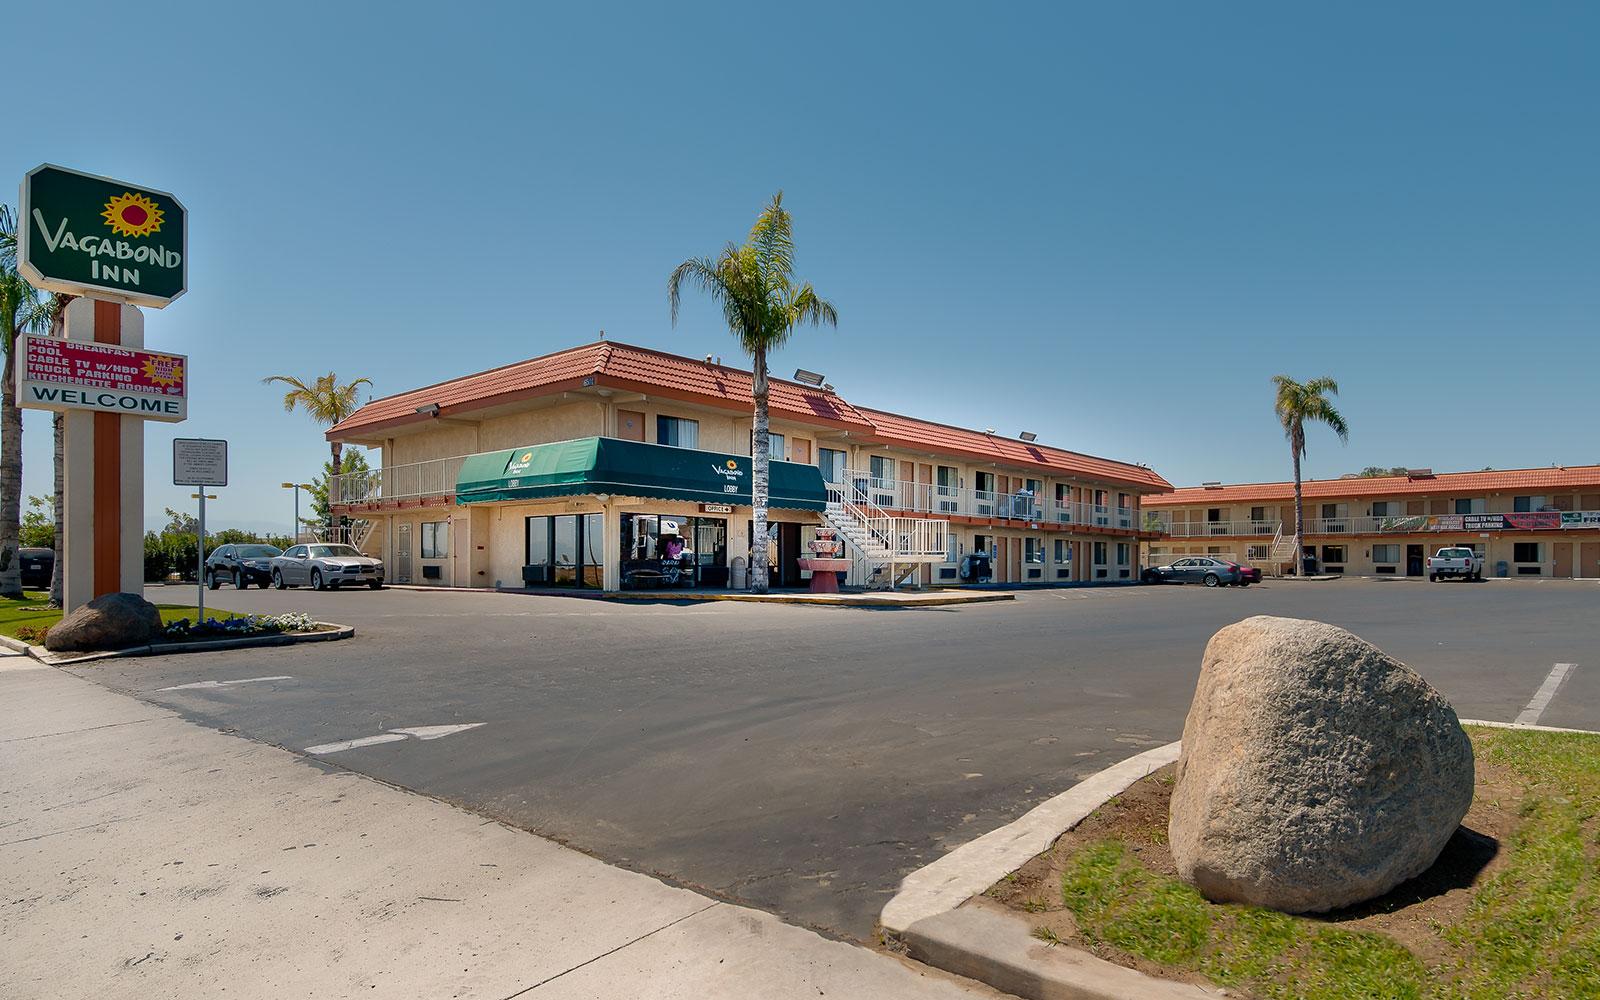 Palm Springs Hotels >> South Bakersfield, CA Hotel - Vagabond Inn Bakersfield (South)